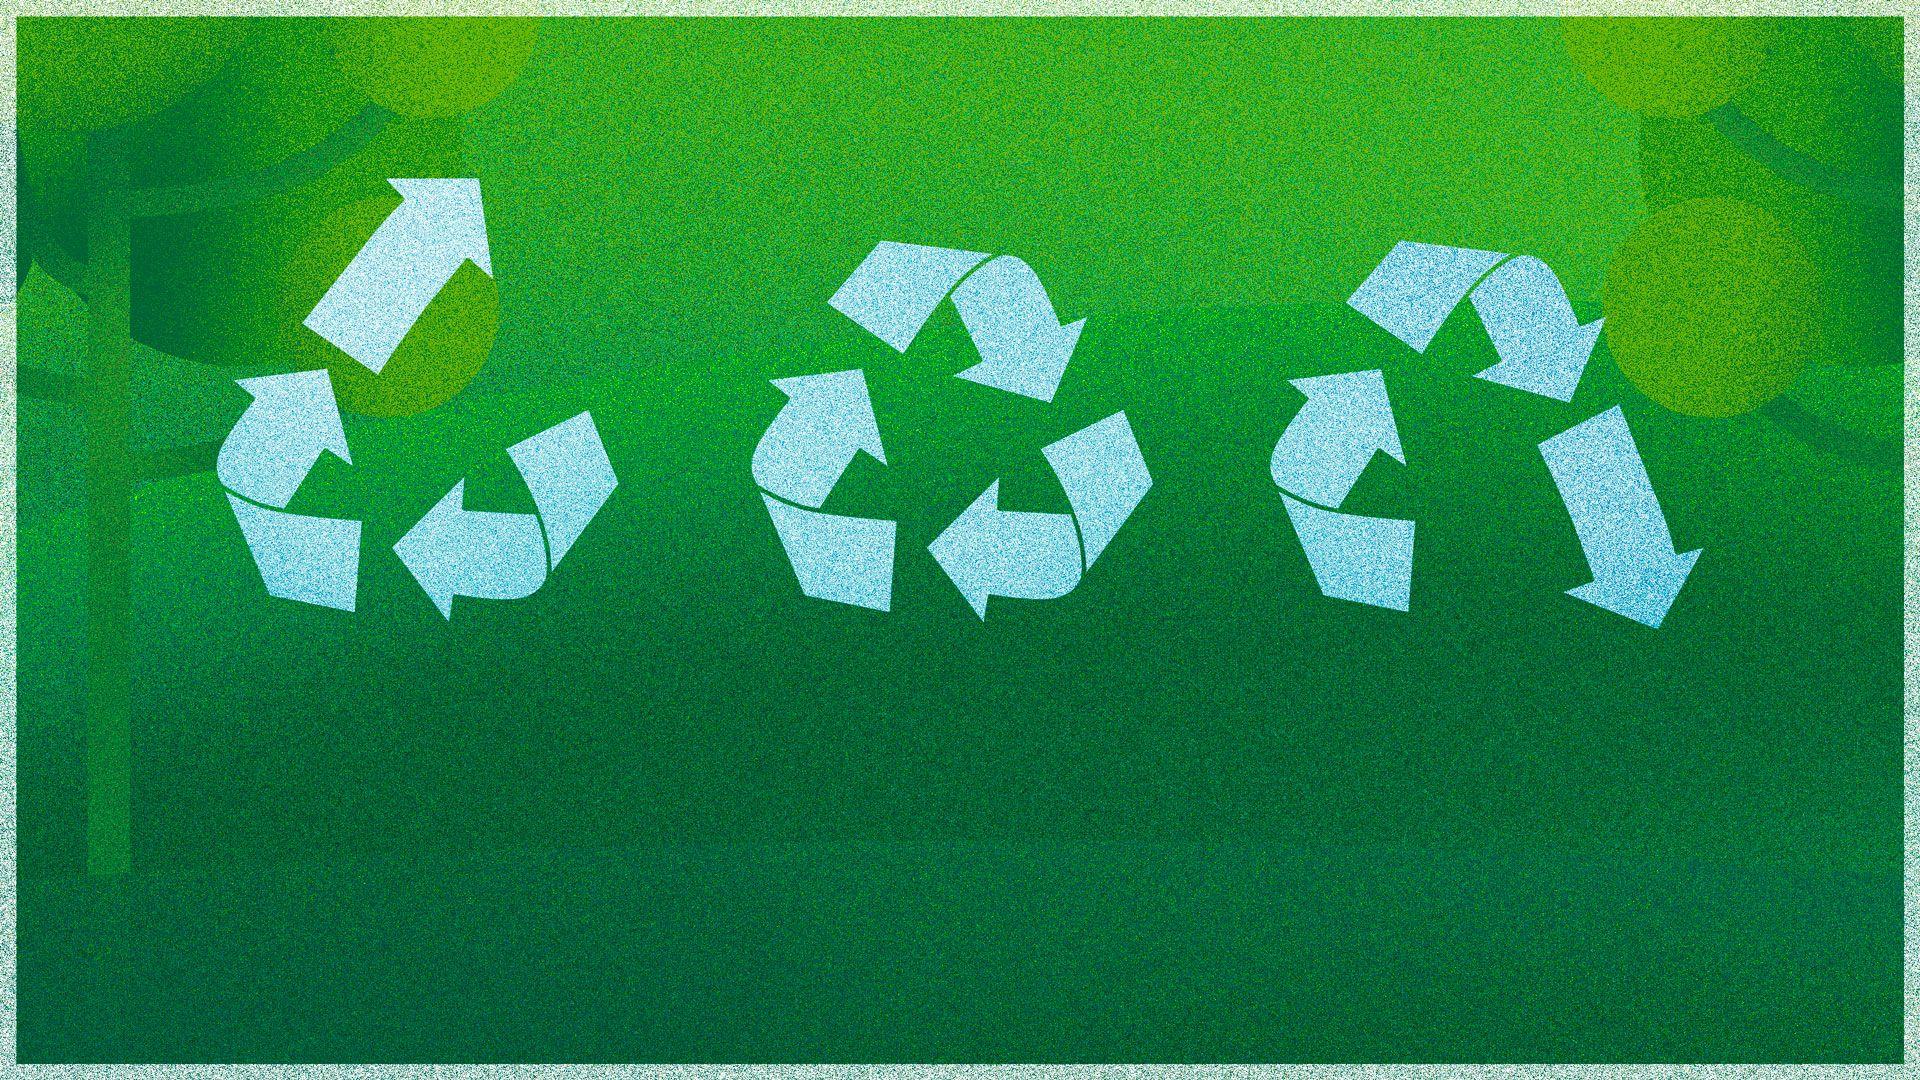 Upcycling, Recycling и Downcycling - Каква е разликата?